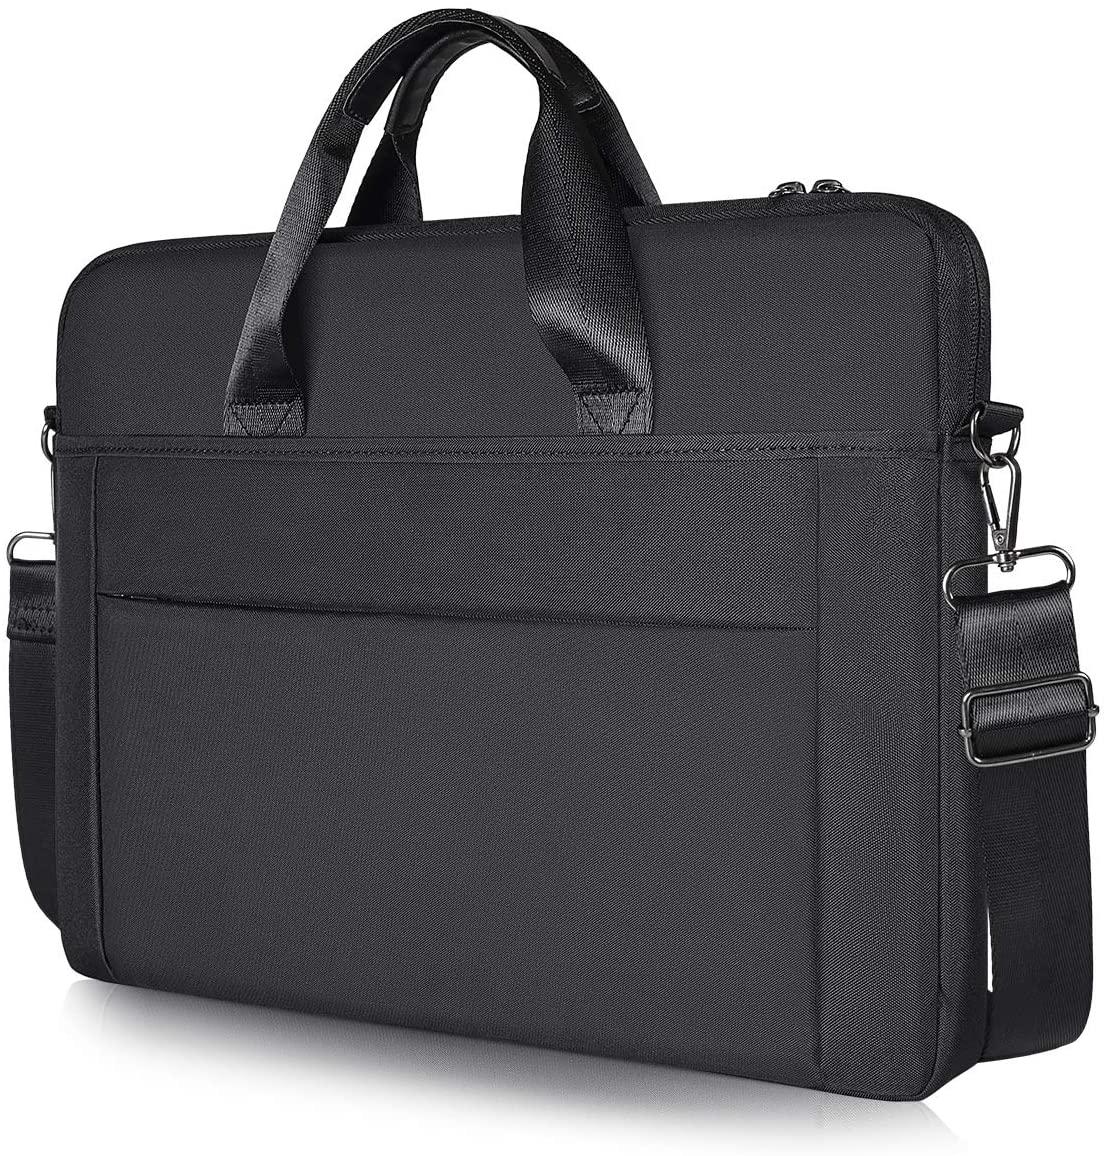 imComor 15.6 inch Laptop Carrying Case for Acer Chromebook 15, ASUS VivoBook 15, 2020 HP 15, 2020 Dell Inspiron 15, 2020 Dell 15 3000, 2019-2020 Lenovo IdeaPad, Shoulder Bag for 15-16 Inch Macbook Pro